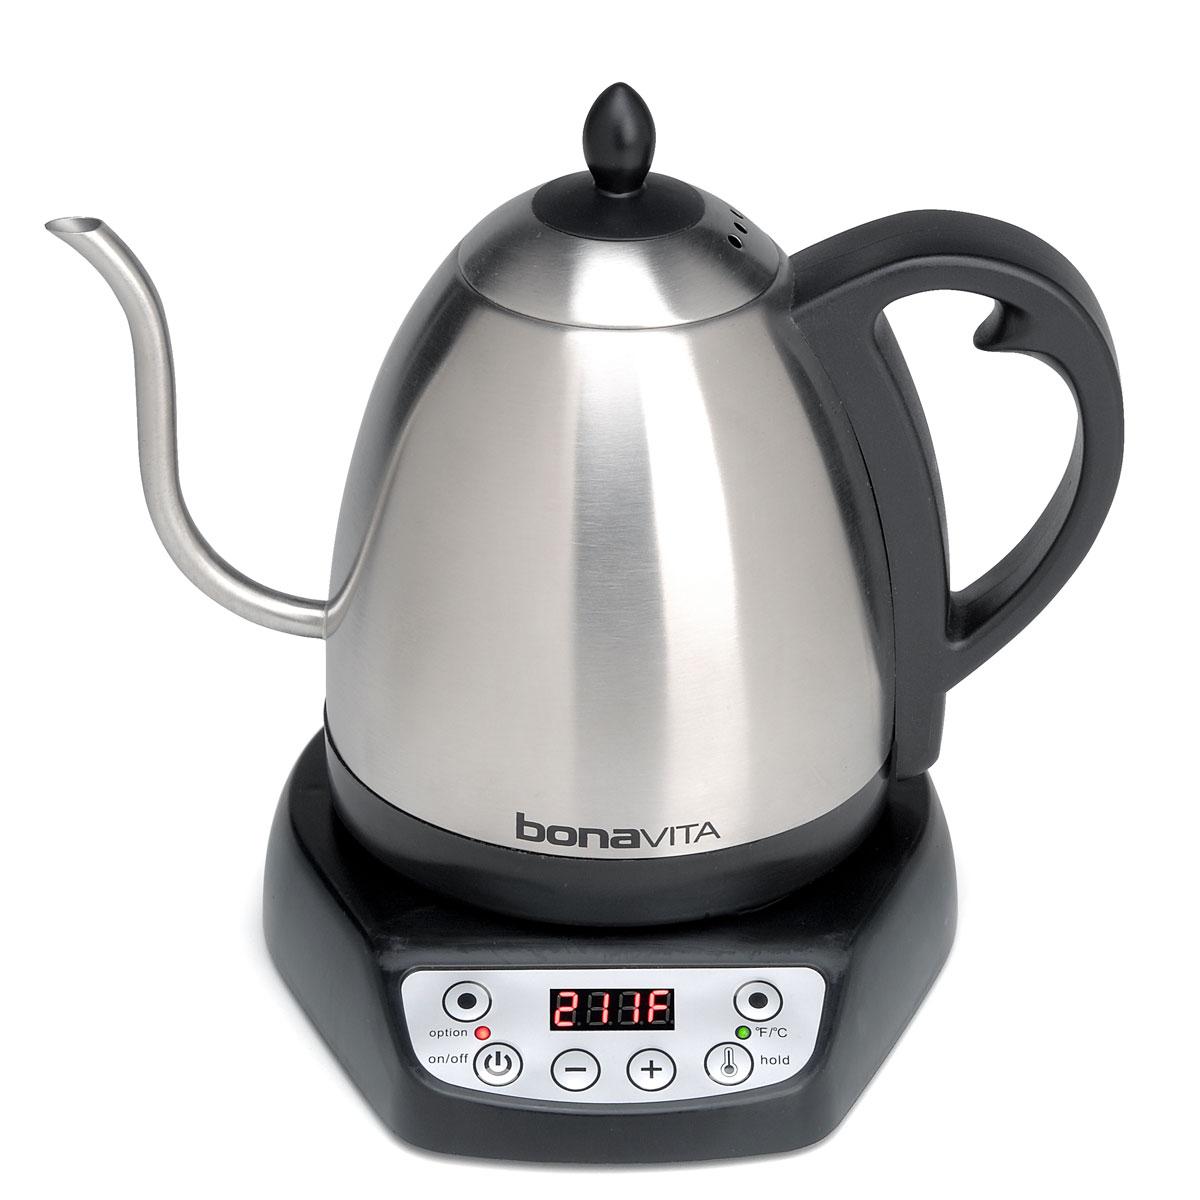 Bonavita Variable Temperature Electric Pouring Kettle - 1L